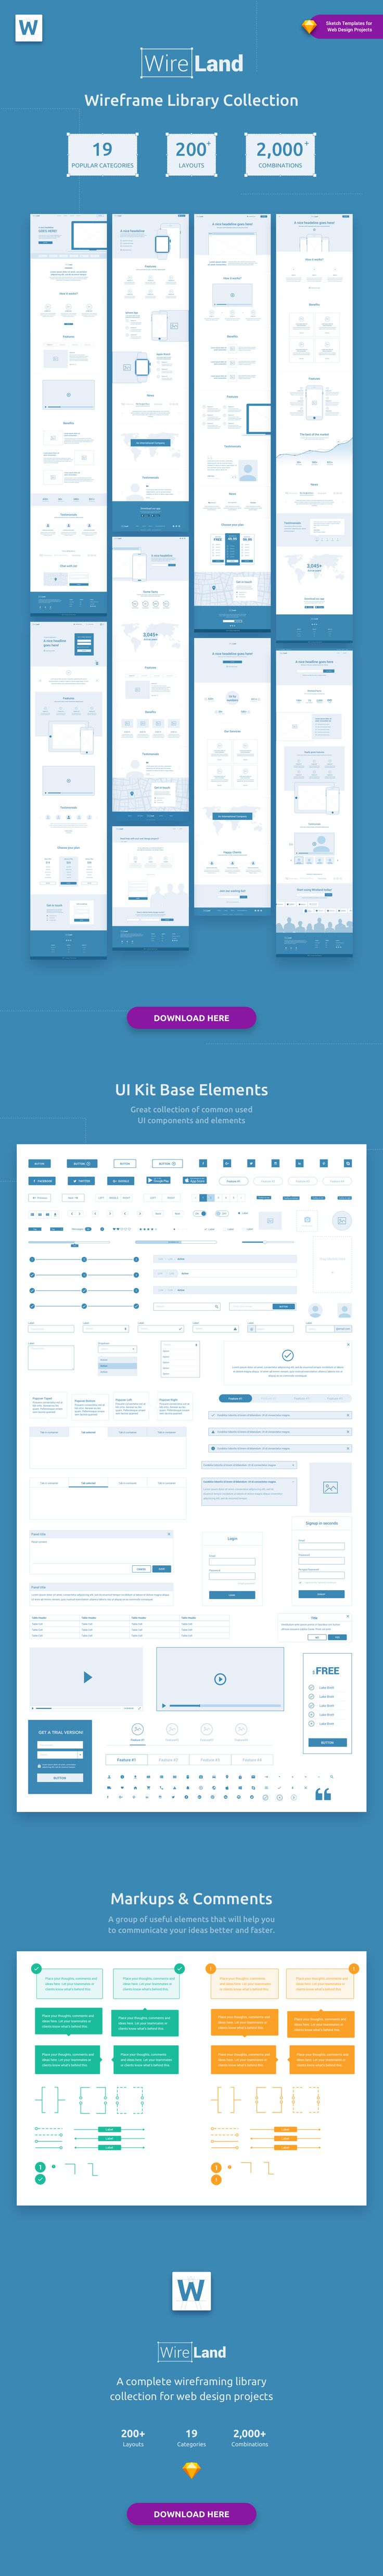 156 best UX/UI images on Pinterest | Design thinking, User ...